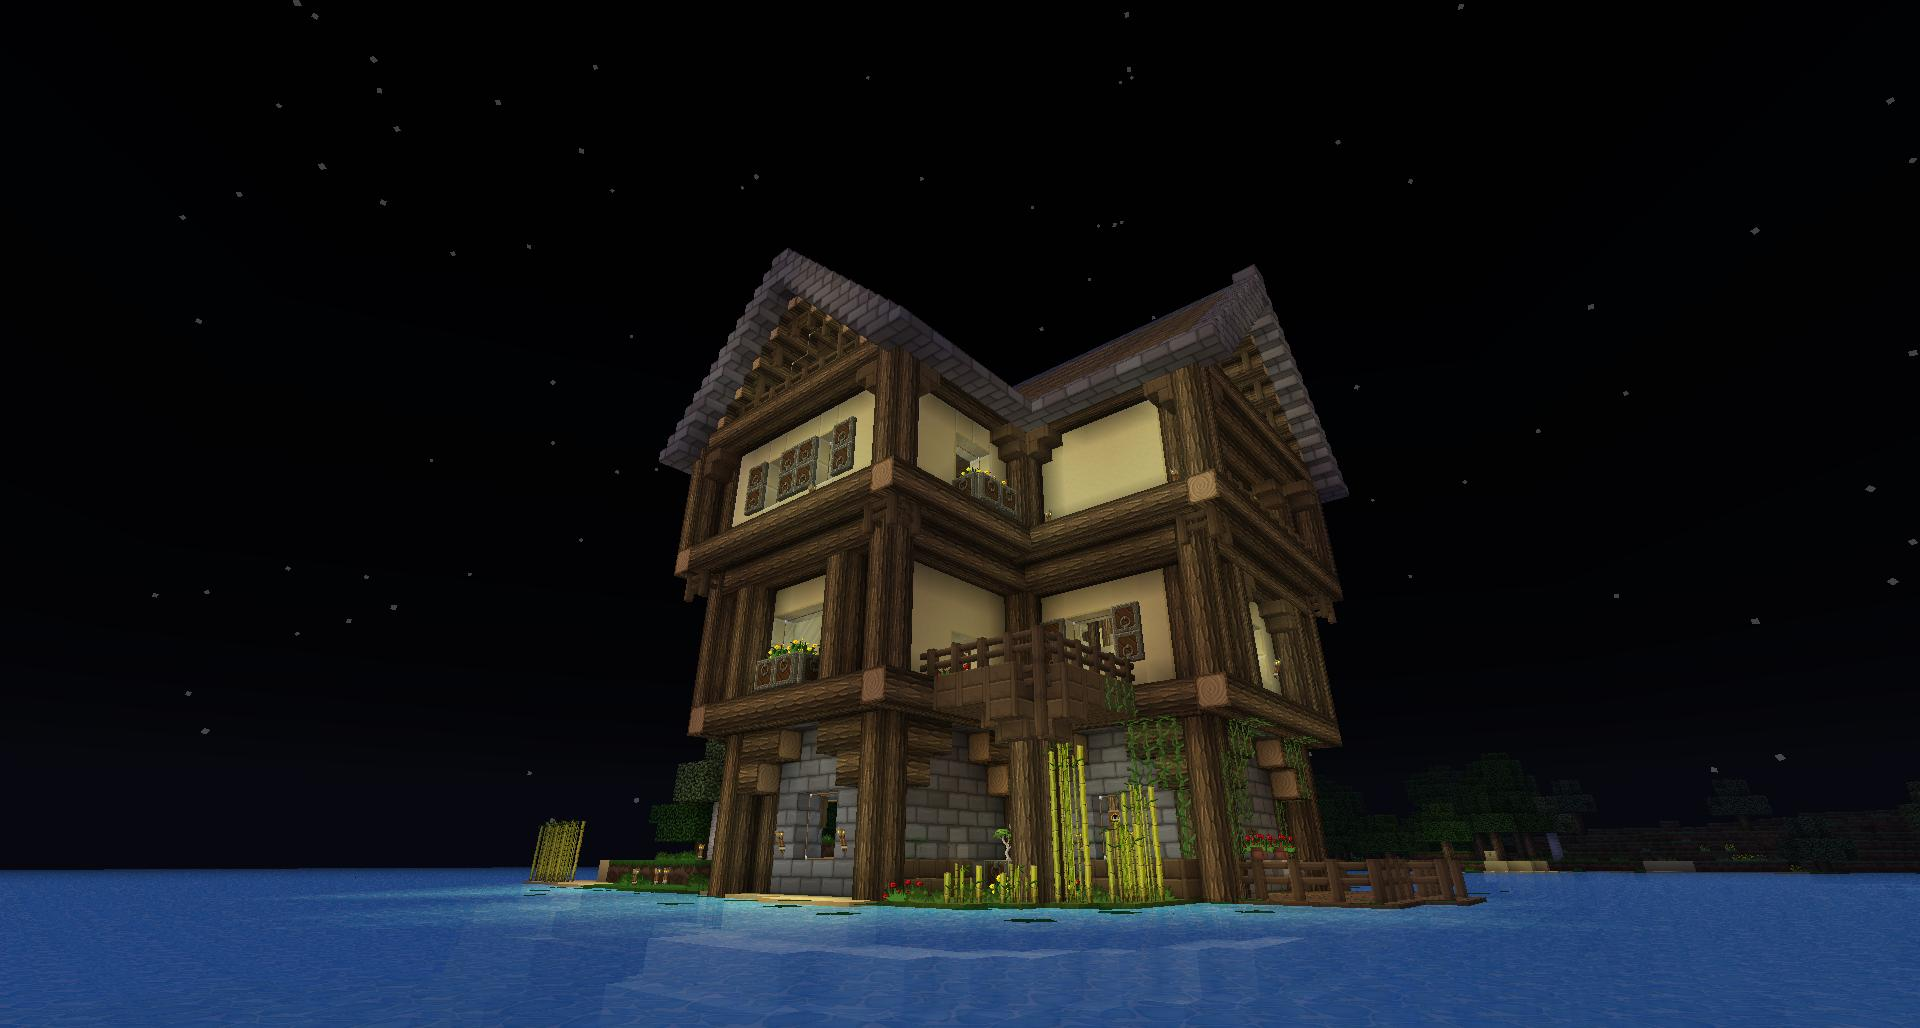 Rosleens Beta house